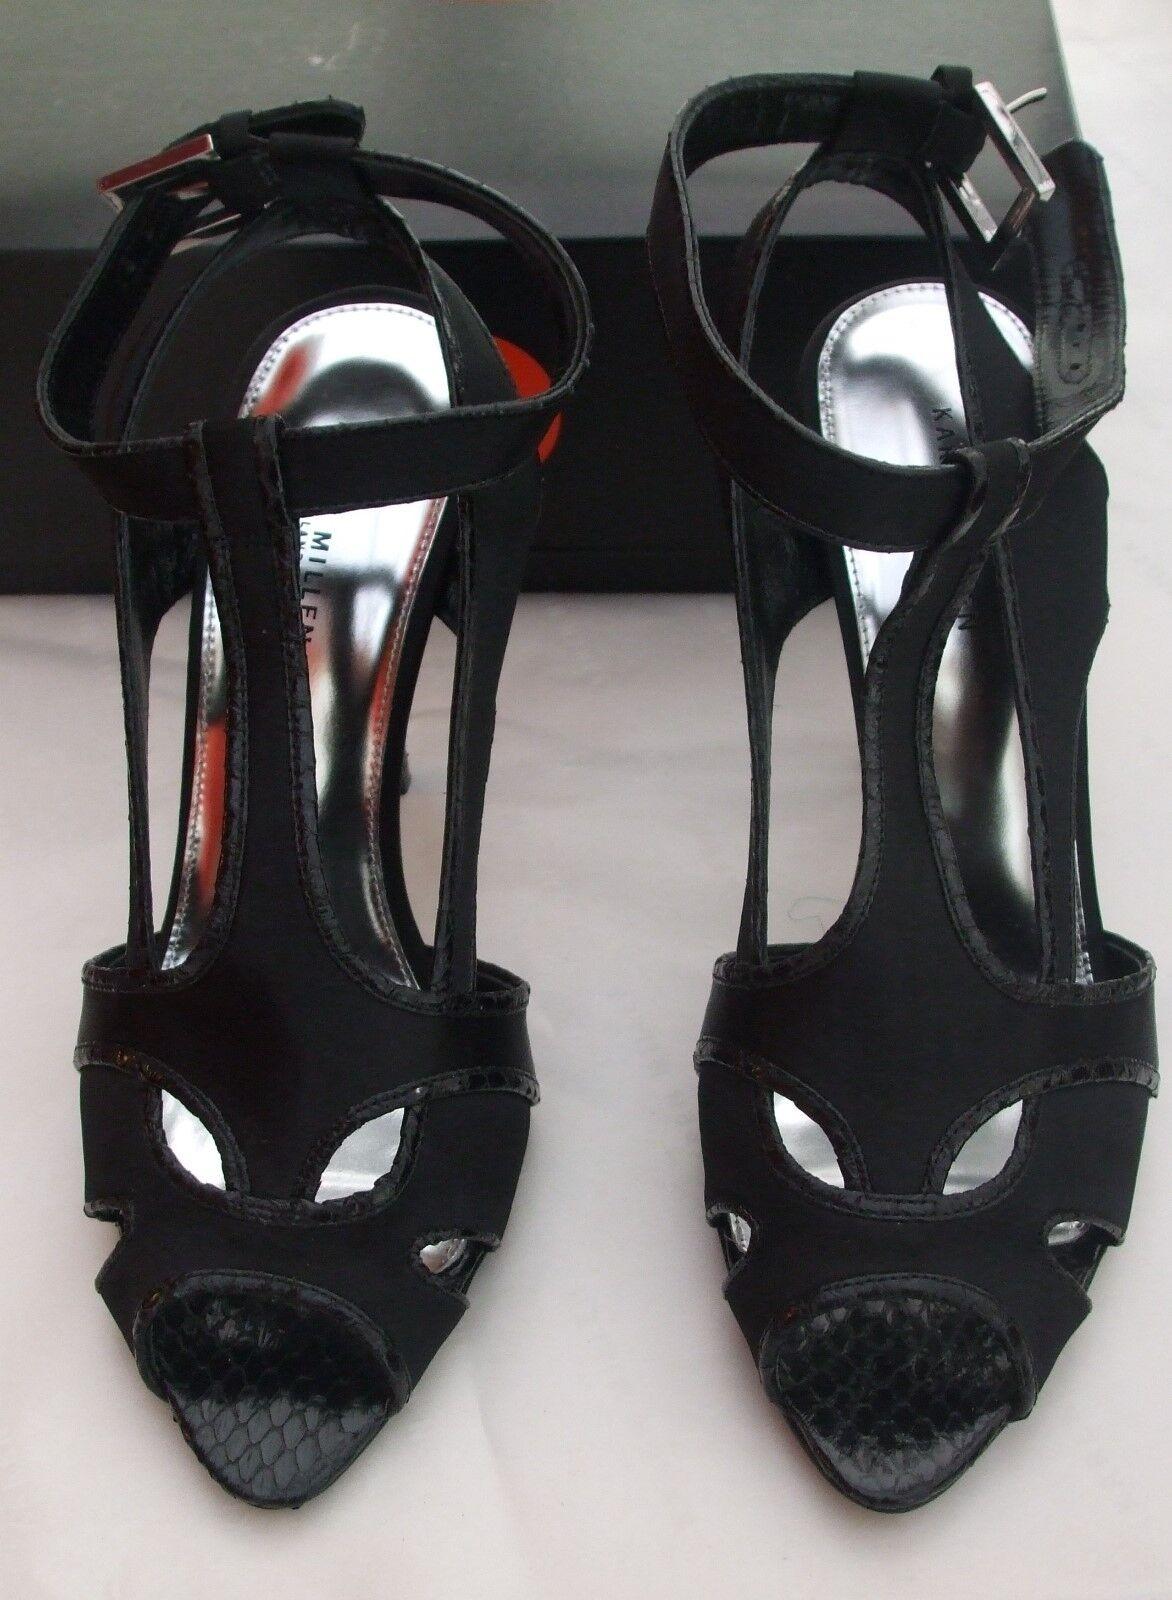 KAREN MILLEN BEAUTIFUL schwarz OPEN TOE schuhe GrößeS 4, 5 & 6